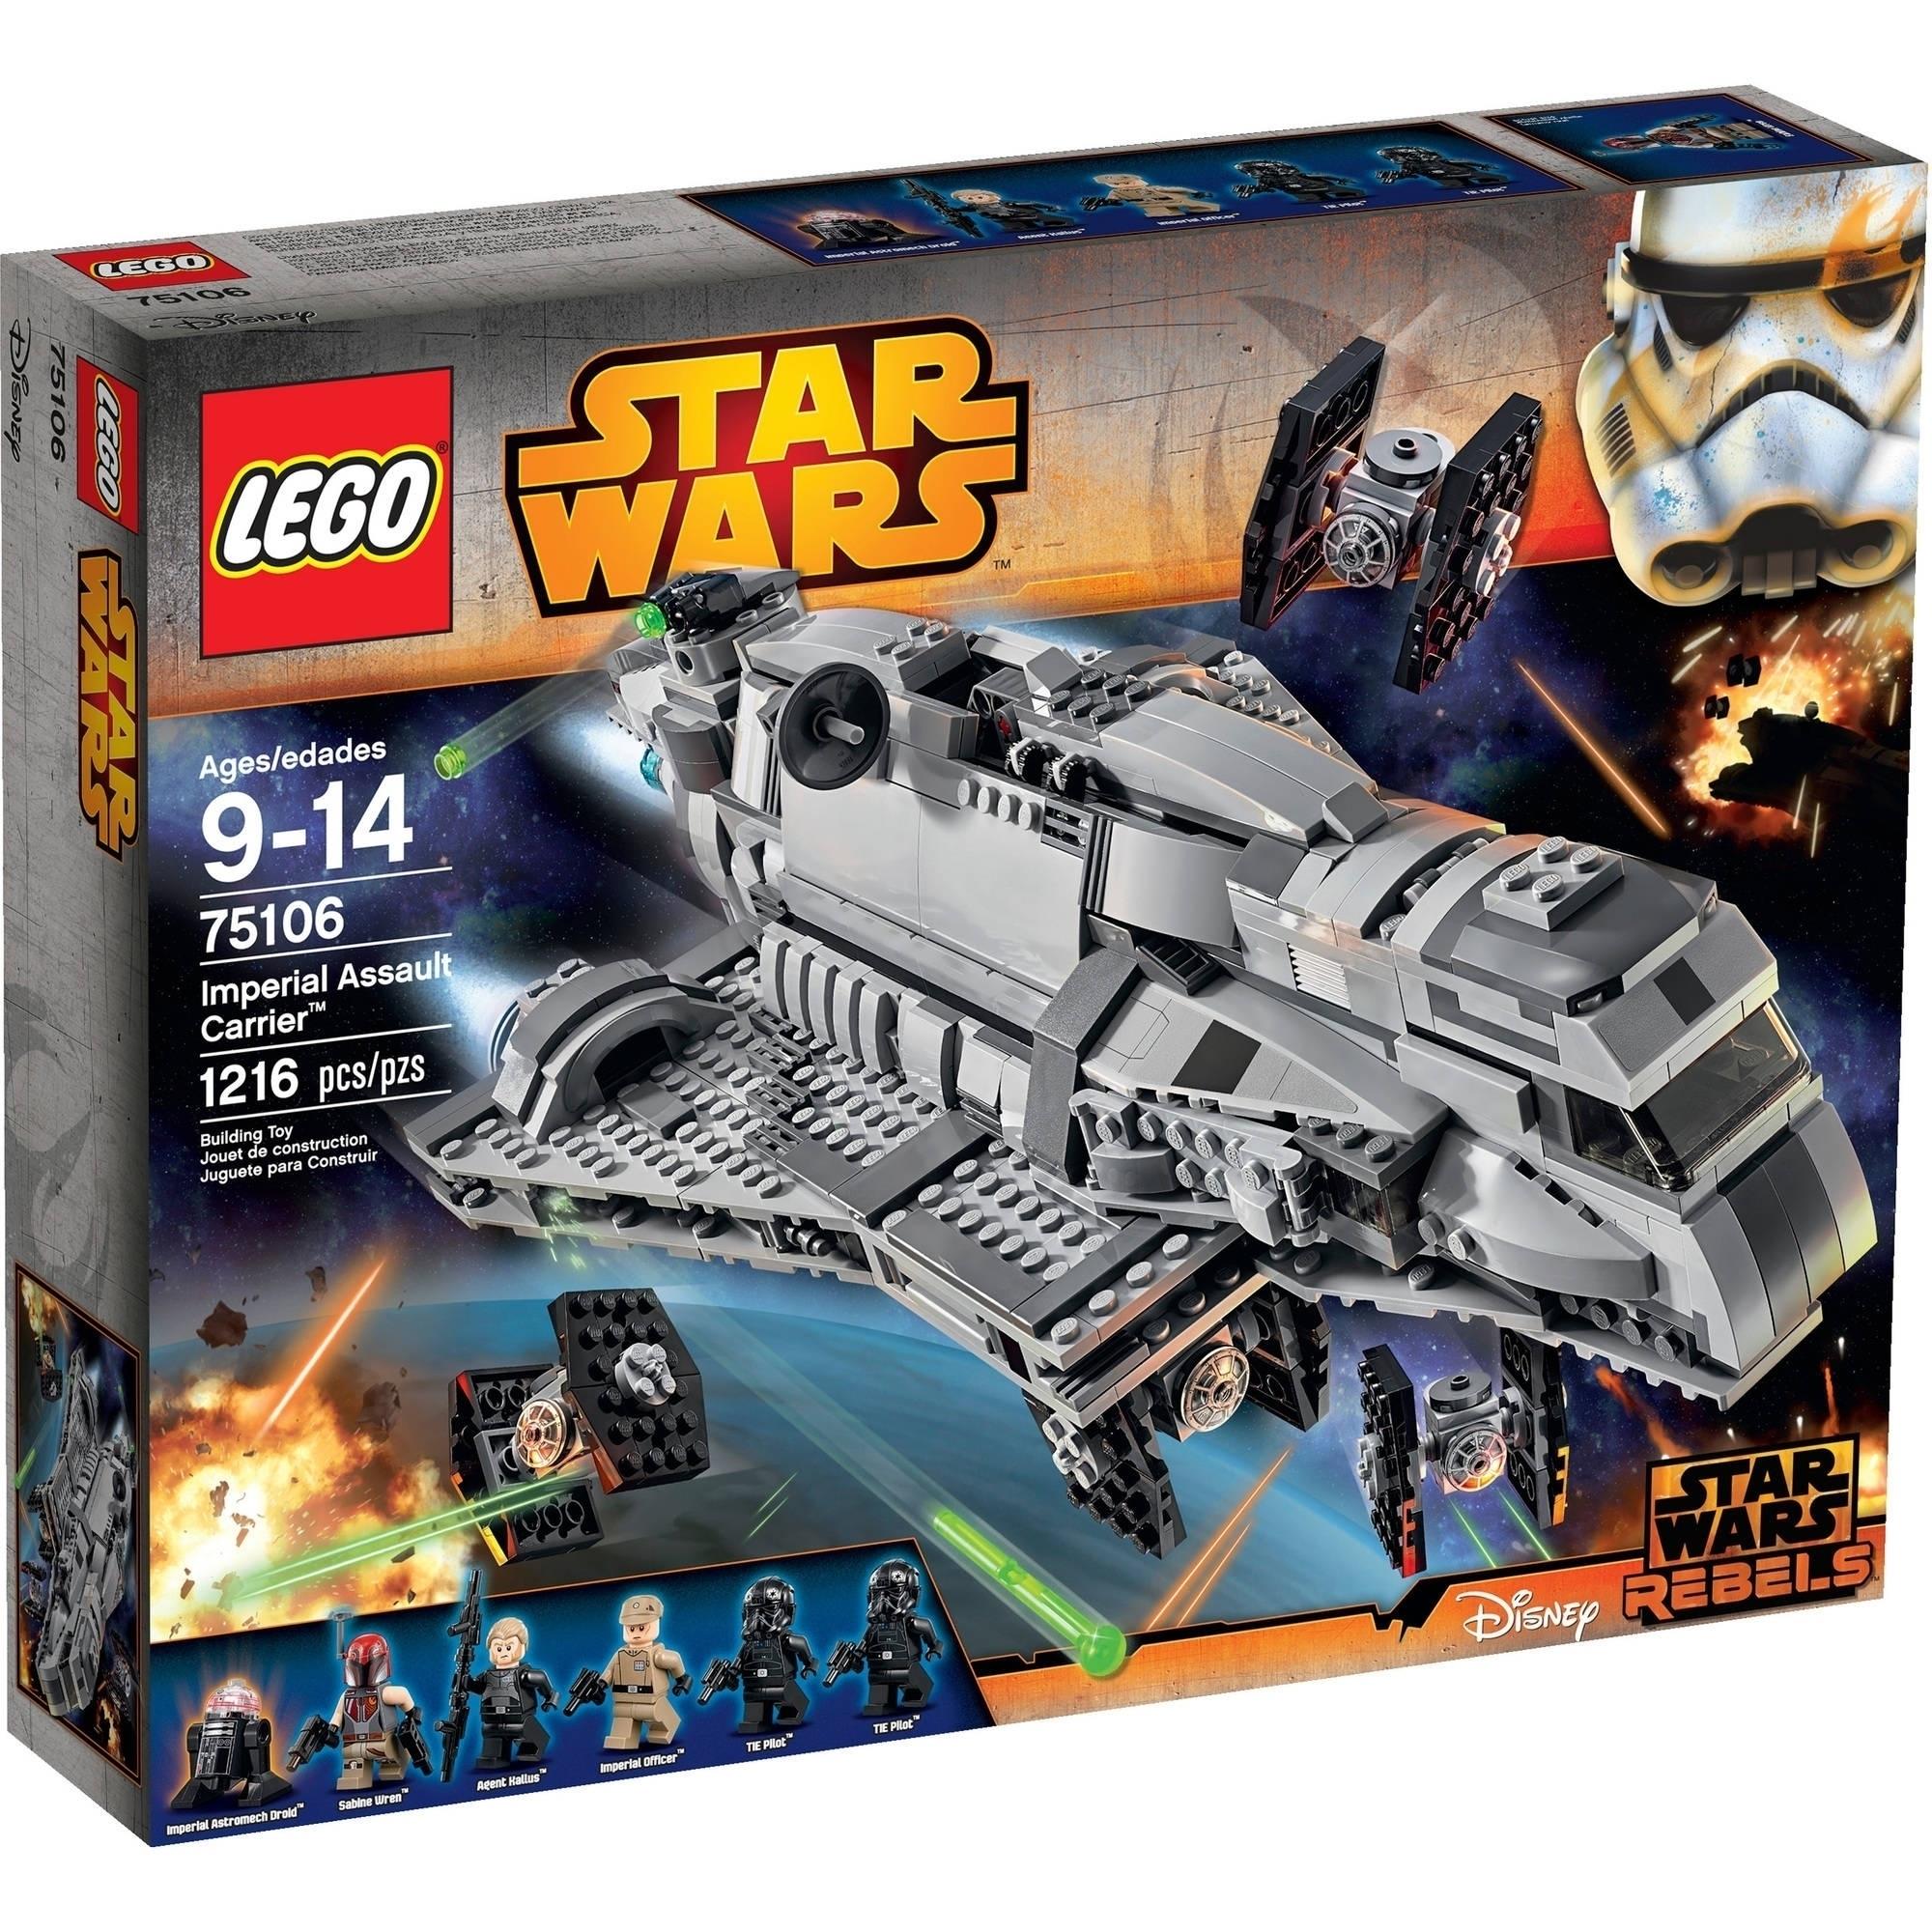 Star Wars Lego Sets Code | Template Calendar Printable for Star Wars Lego Sets Code